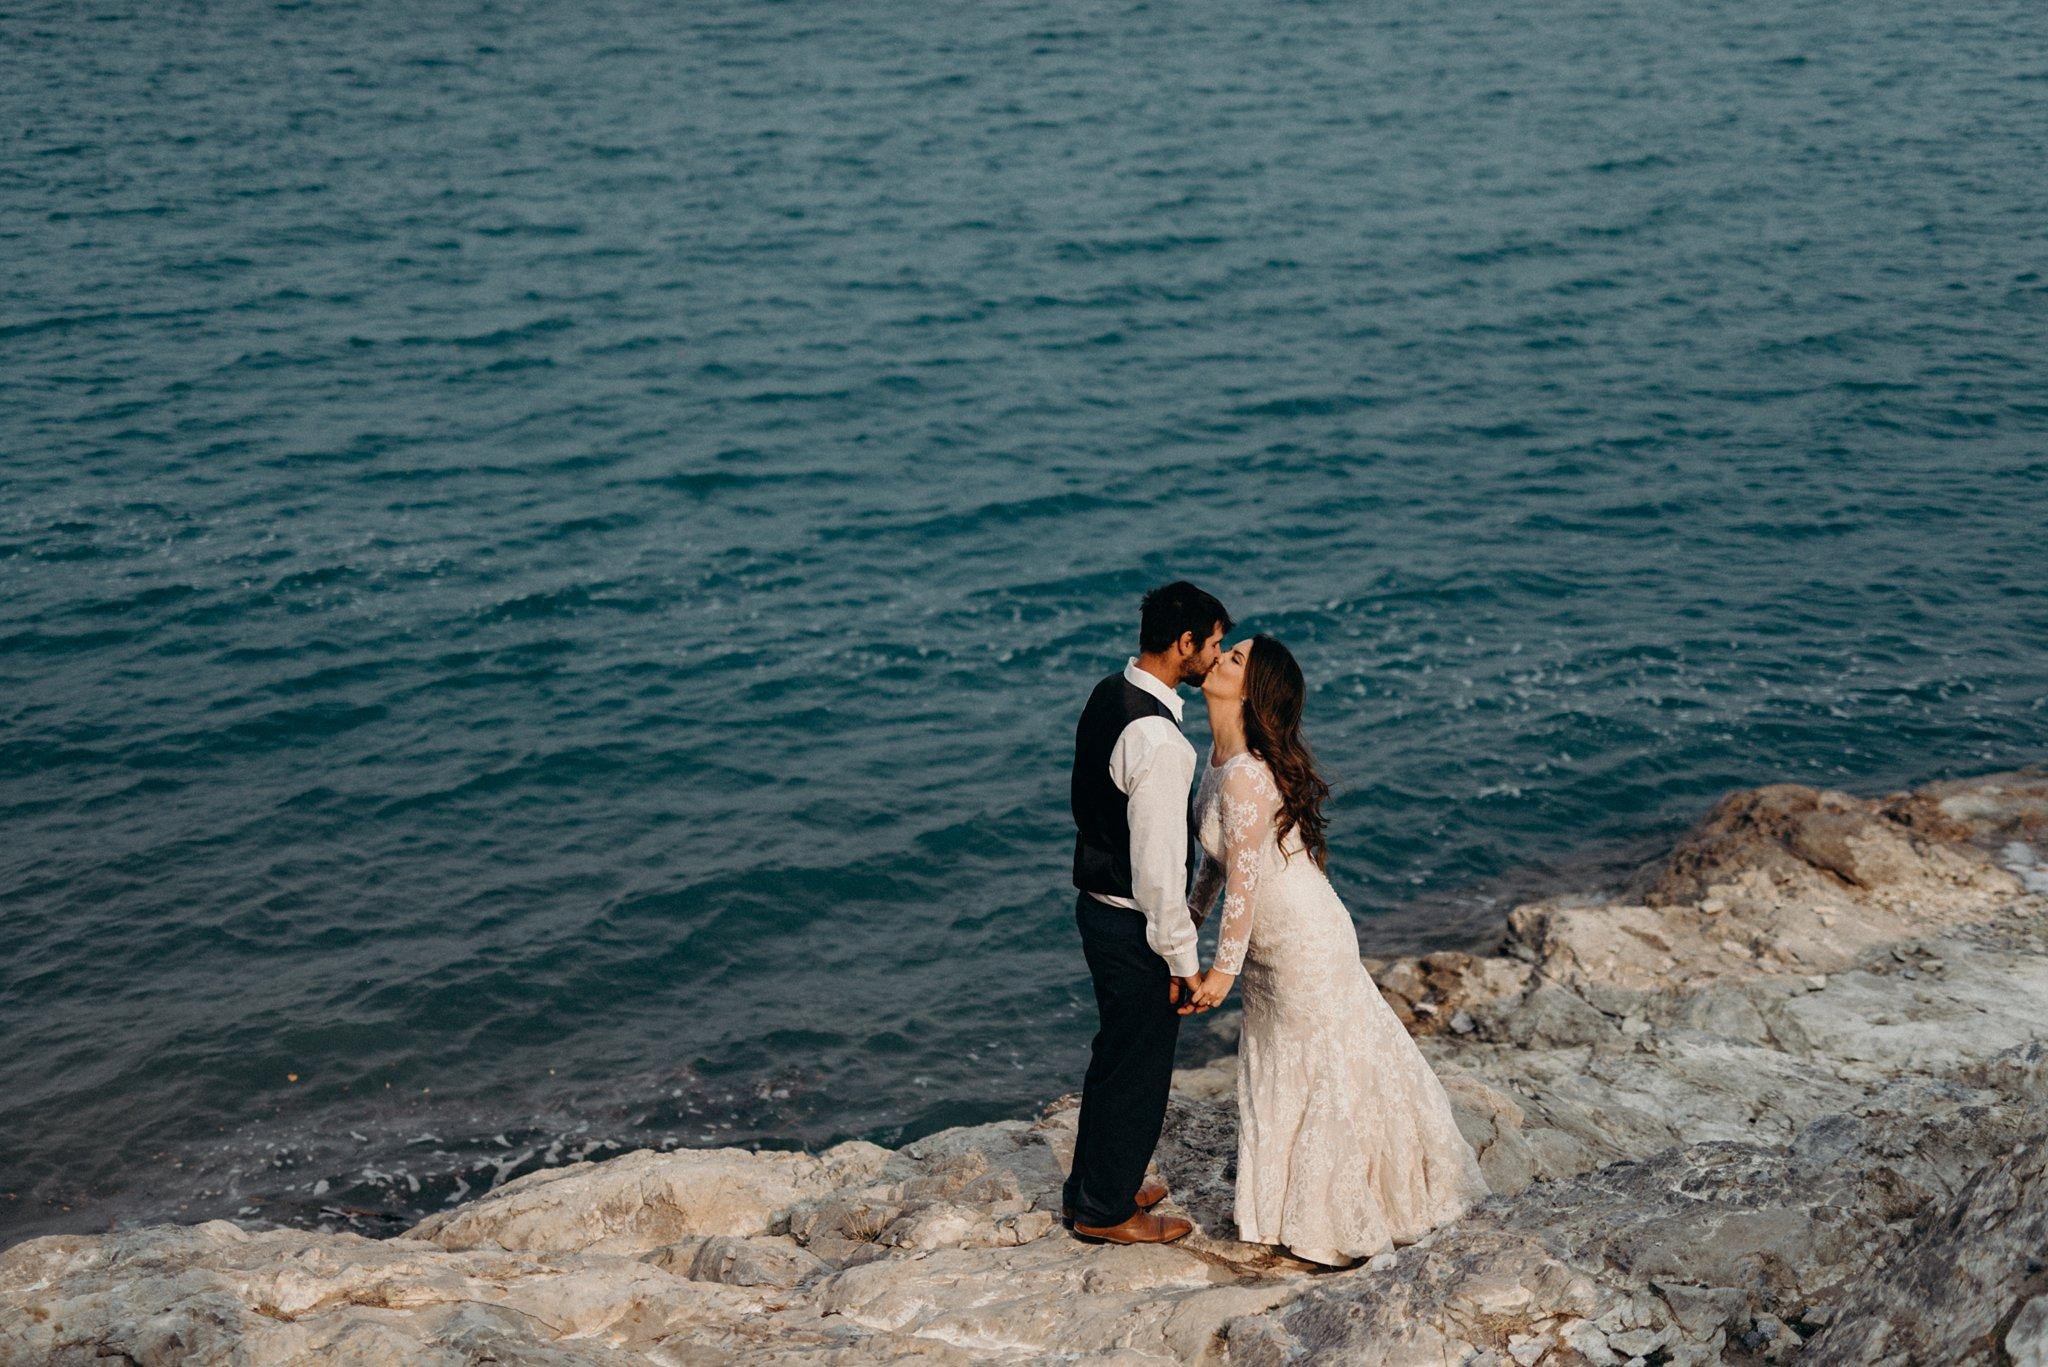 kaihla_tonai_intimate_wedding_elopement_photographer_6748.jpg